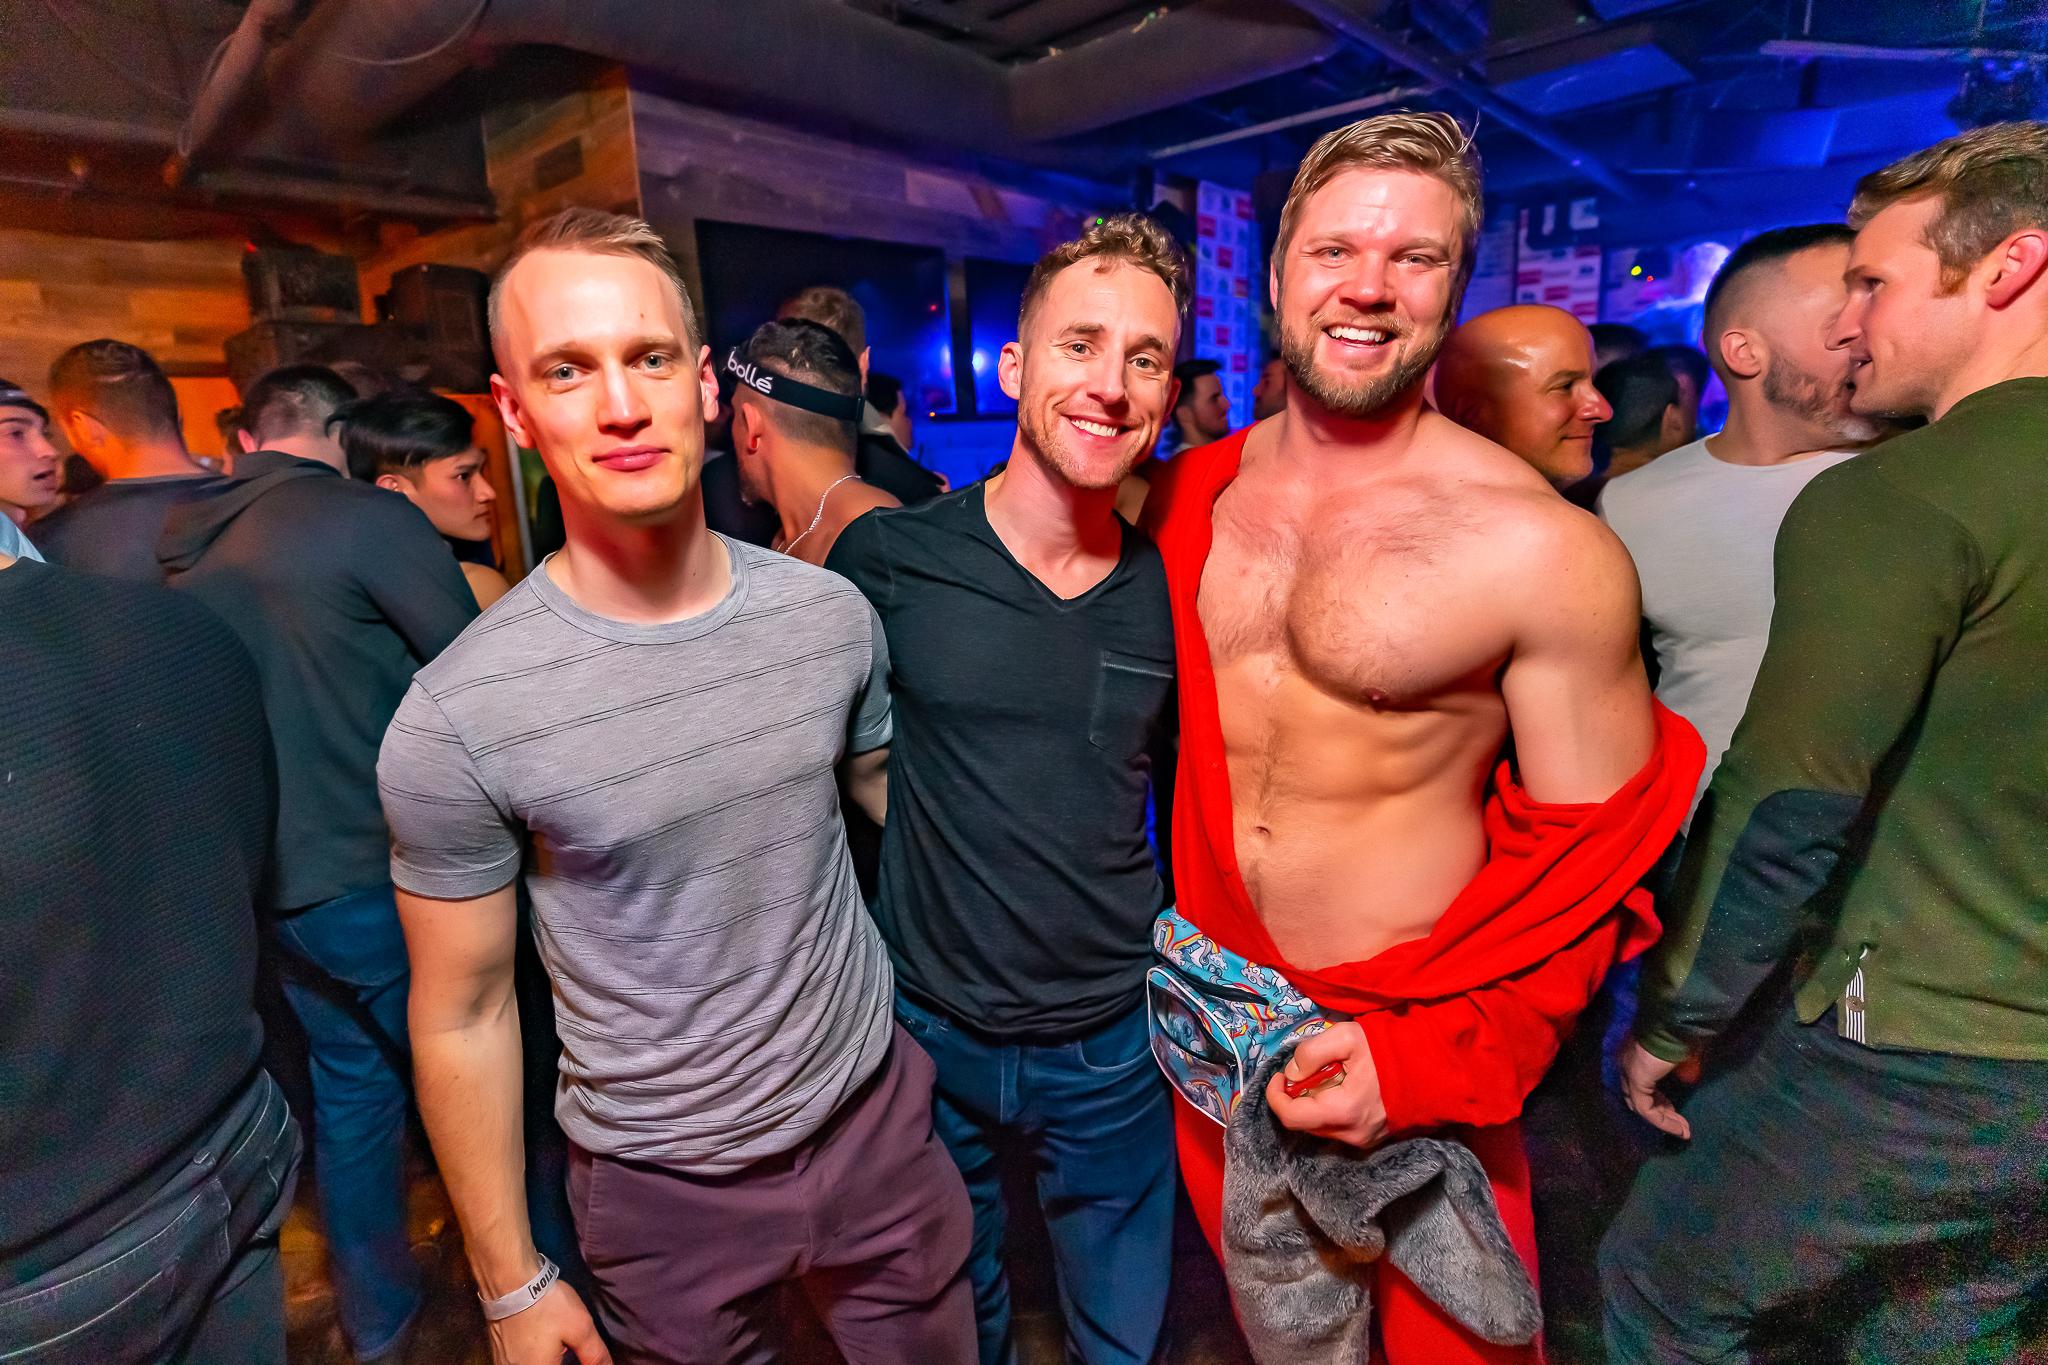 2.22.2019 Elevation Gay Ski week Cabin 130